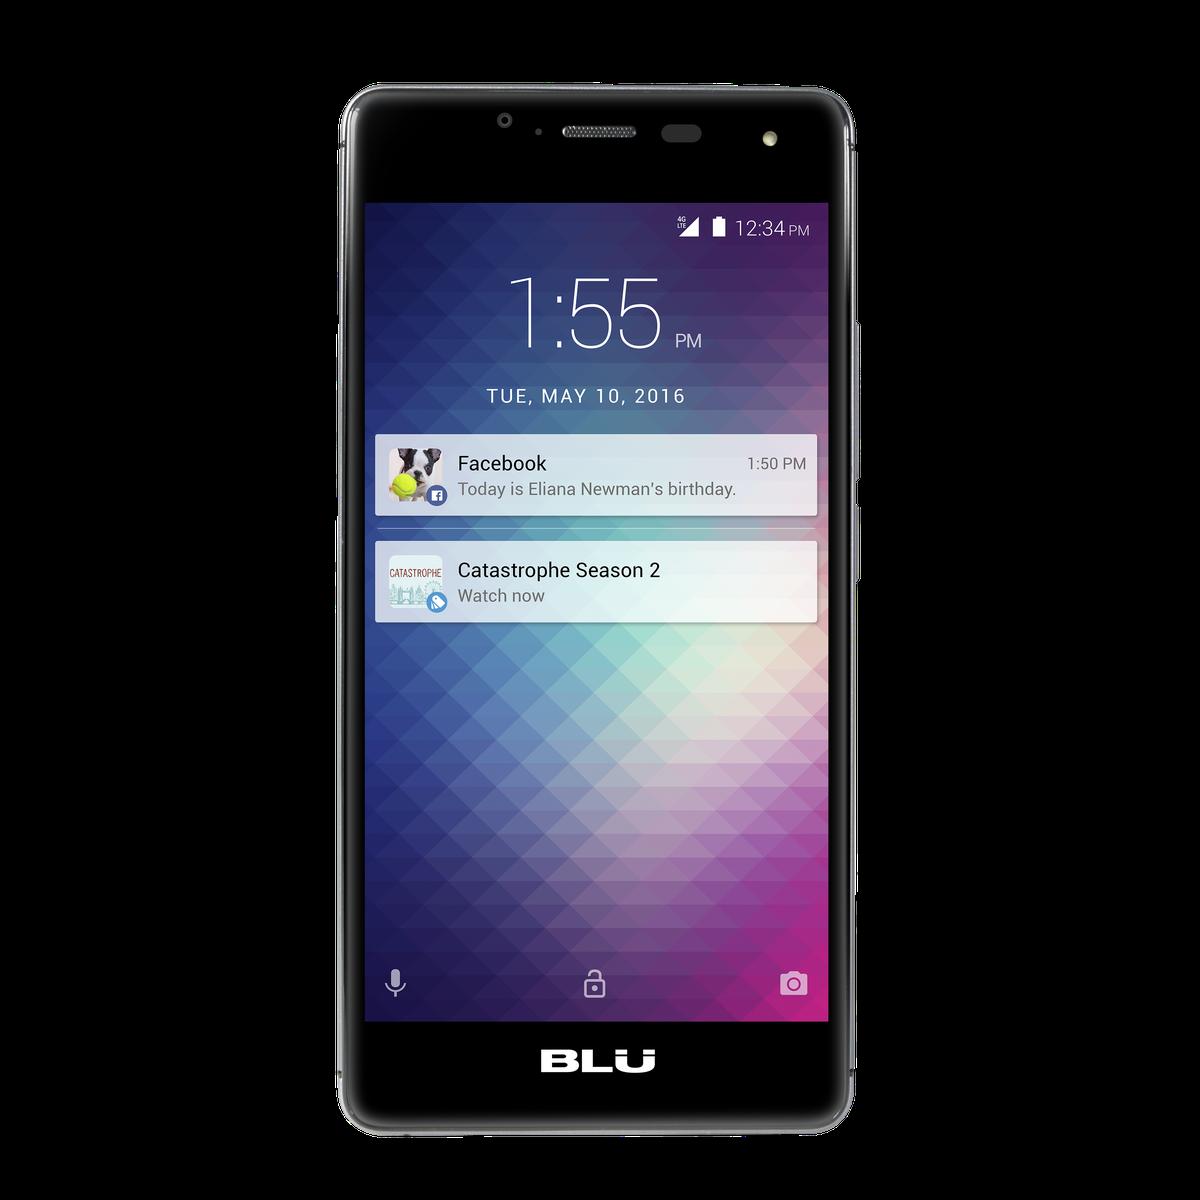 Amazon-Prime-unlocked-ads-Android-smartphone-2016